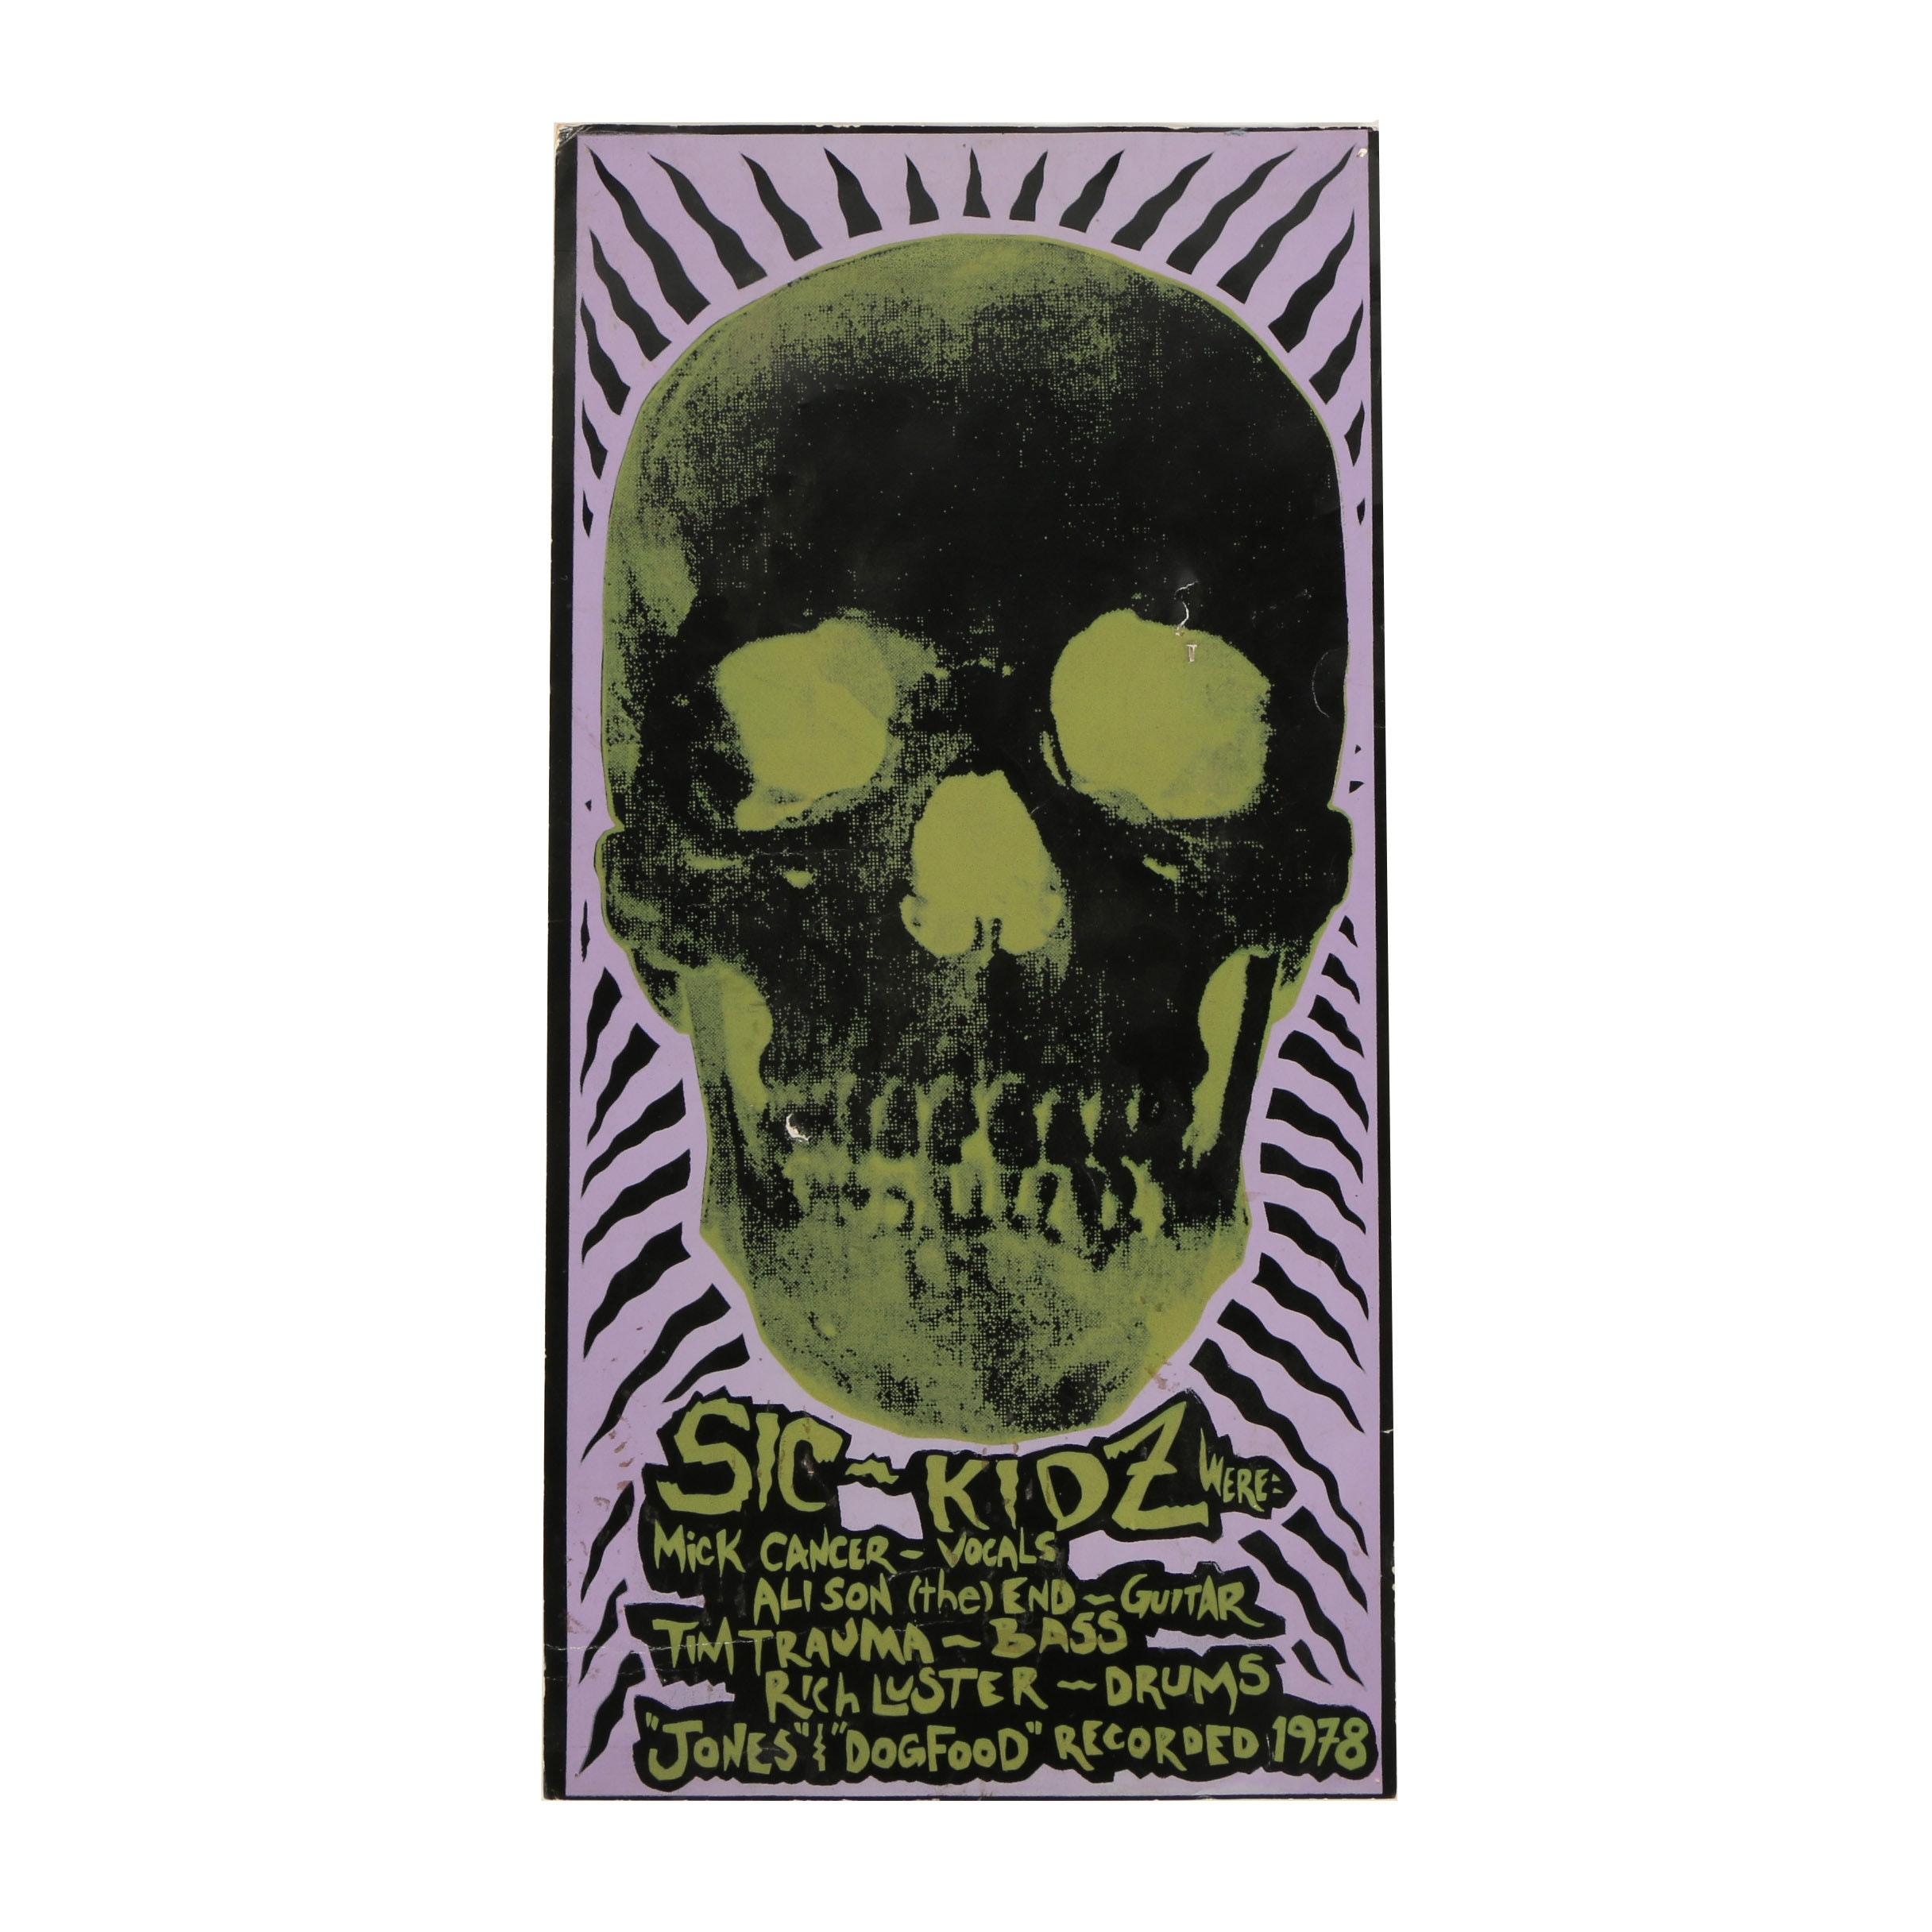 Serigraph Poster For Sic-Kidz